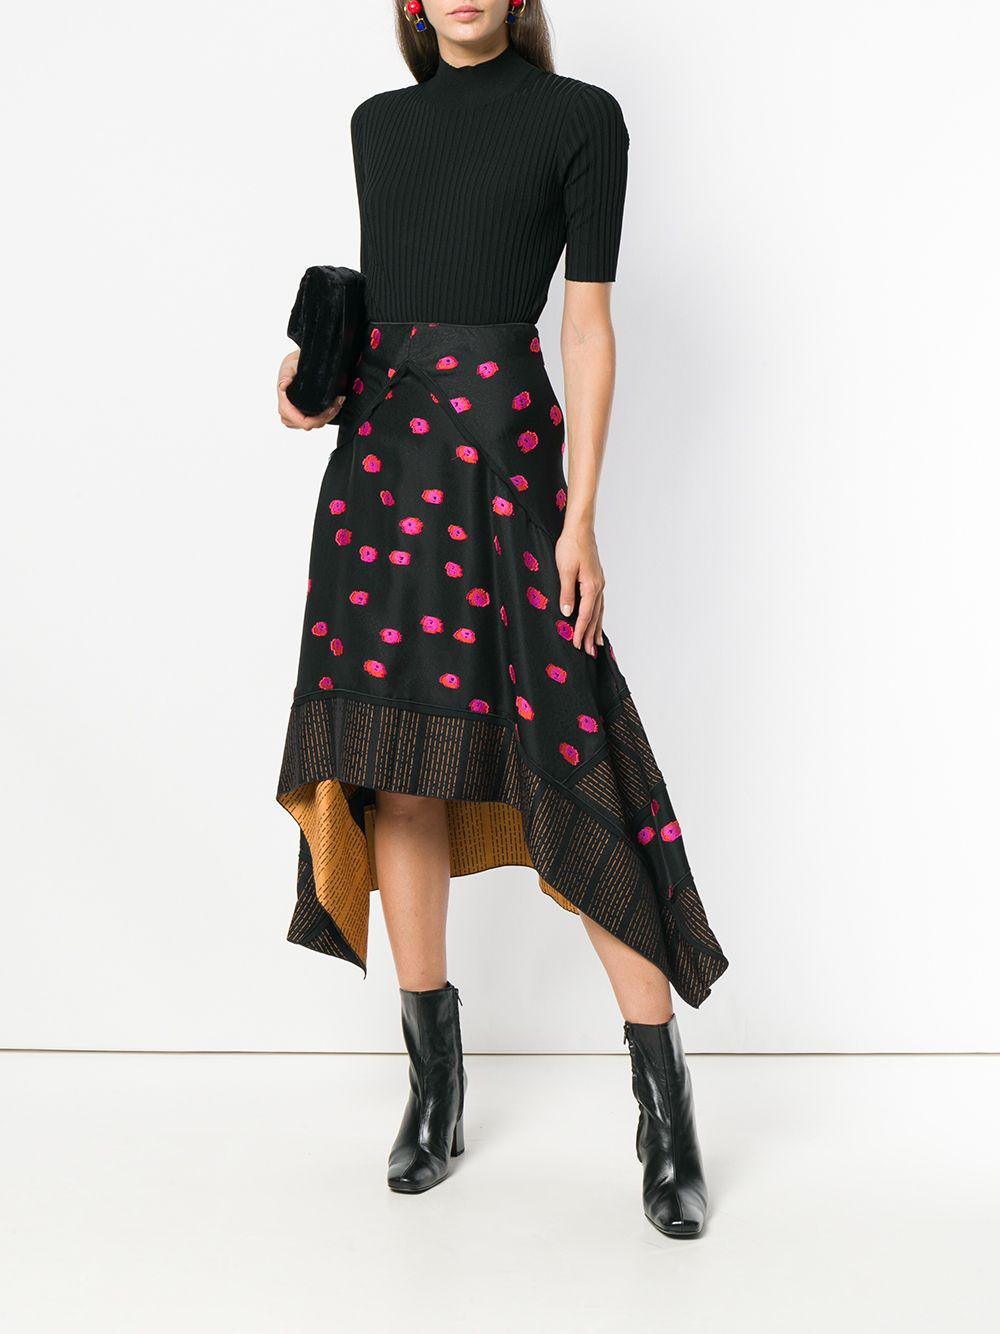 Diane von Furstenberg Synthetic Turtleneck Rib Top in Black